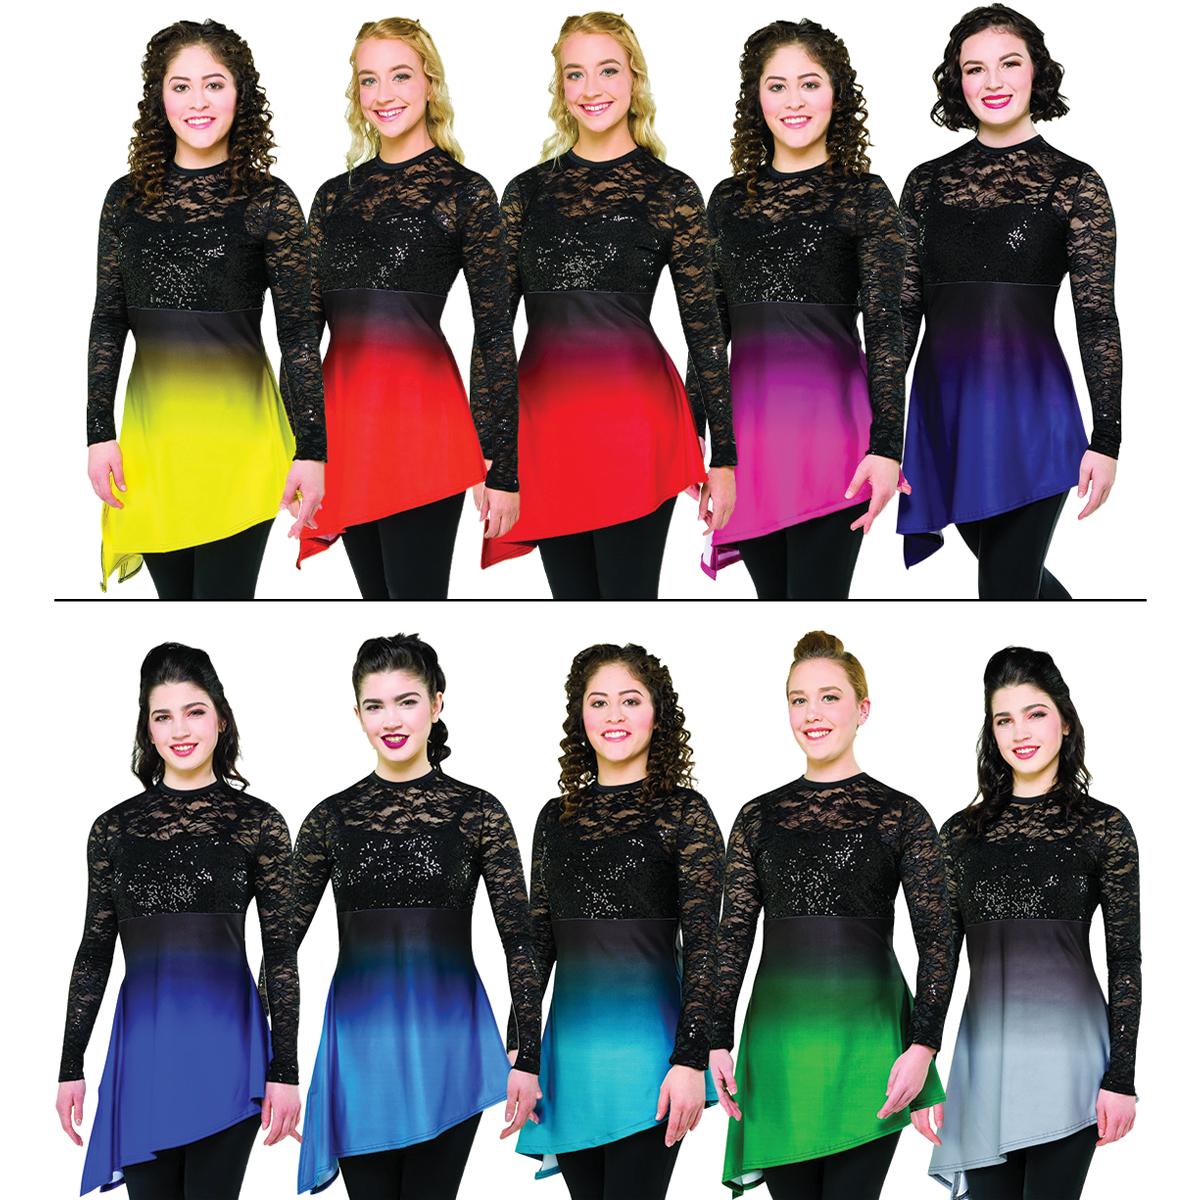 Custom Marching Band Uniforms | Band Shoppe  |Band Shoppe Uniforms